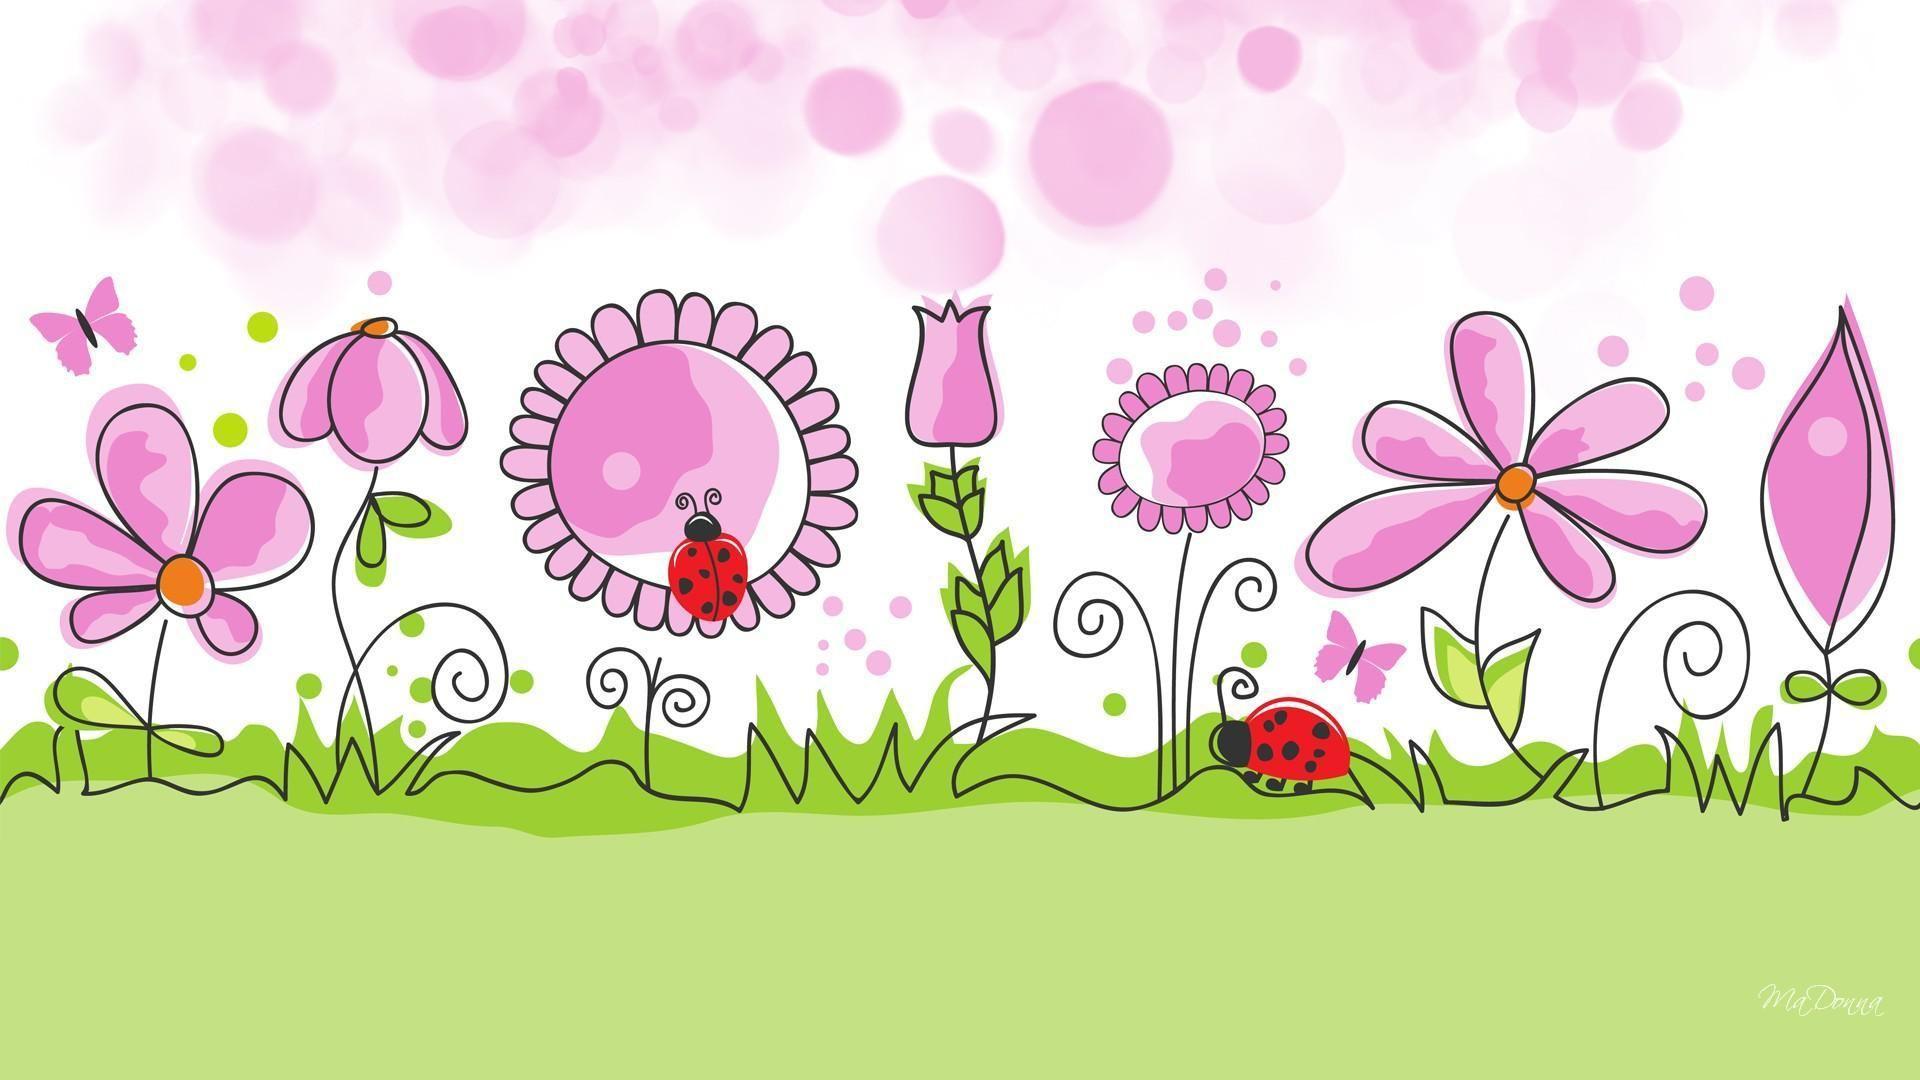 Cartoon Flower Desktop Wallpapers Top Free Cartoon Flower Desktop Backgrounds Wallpaperaccess